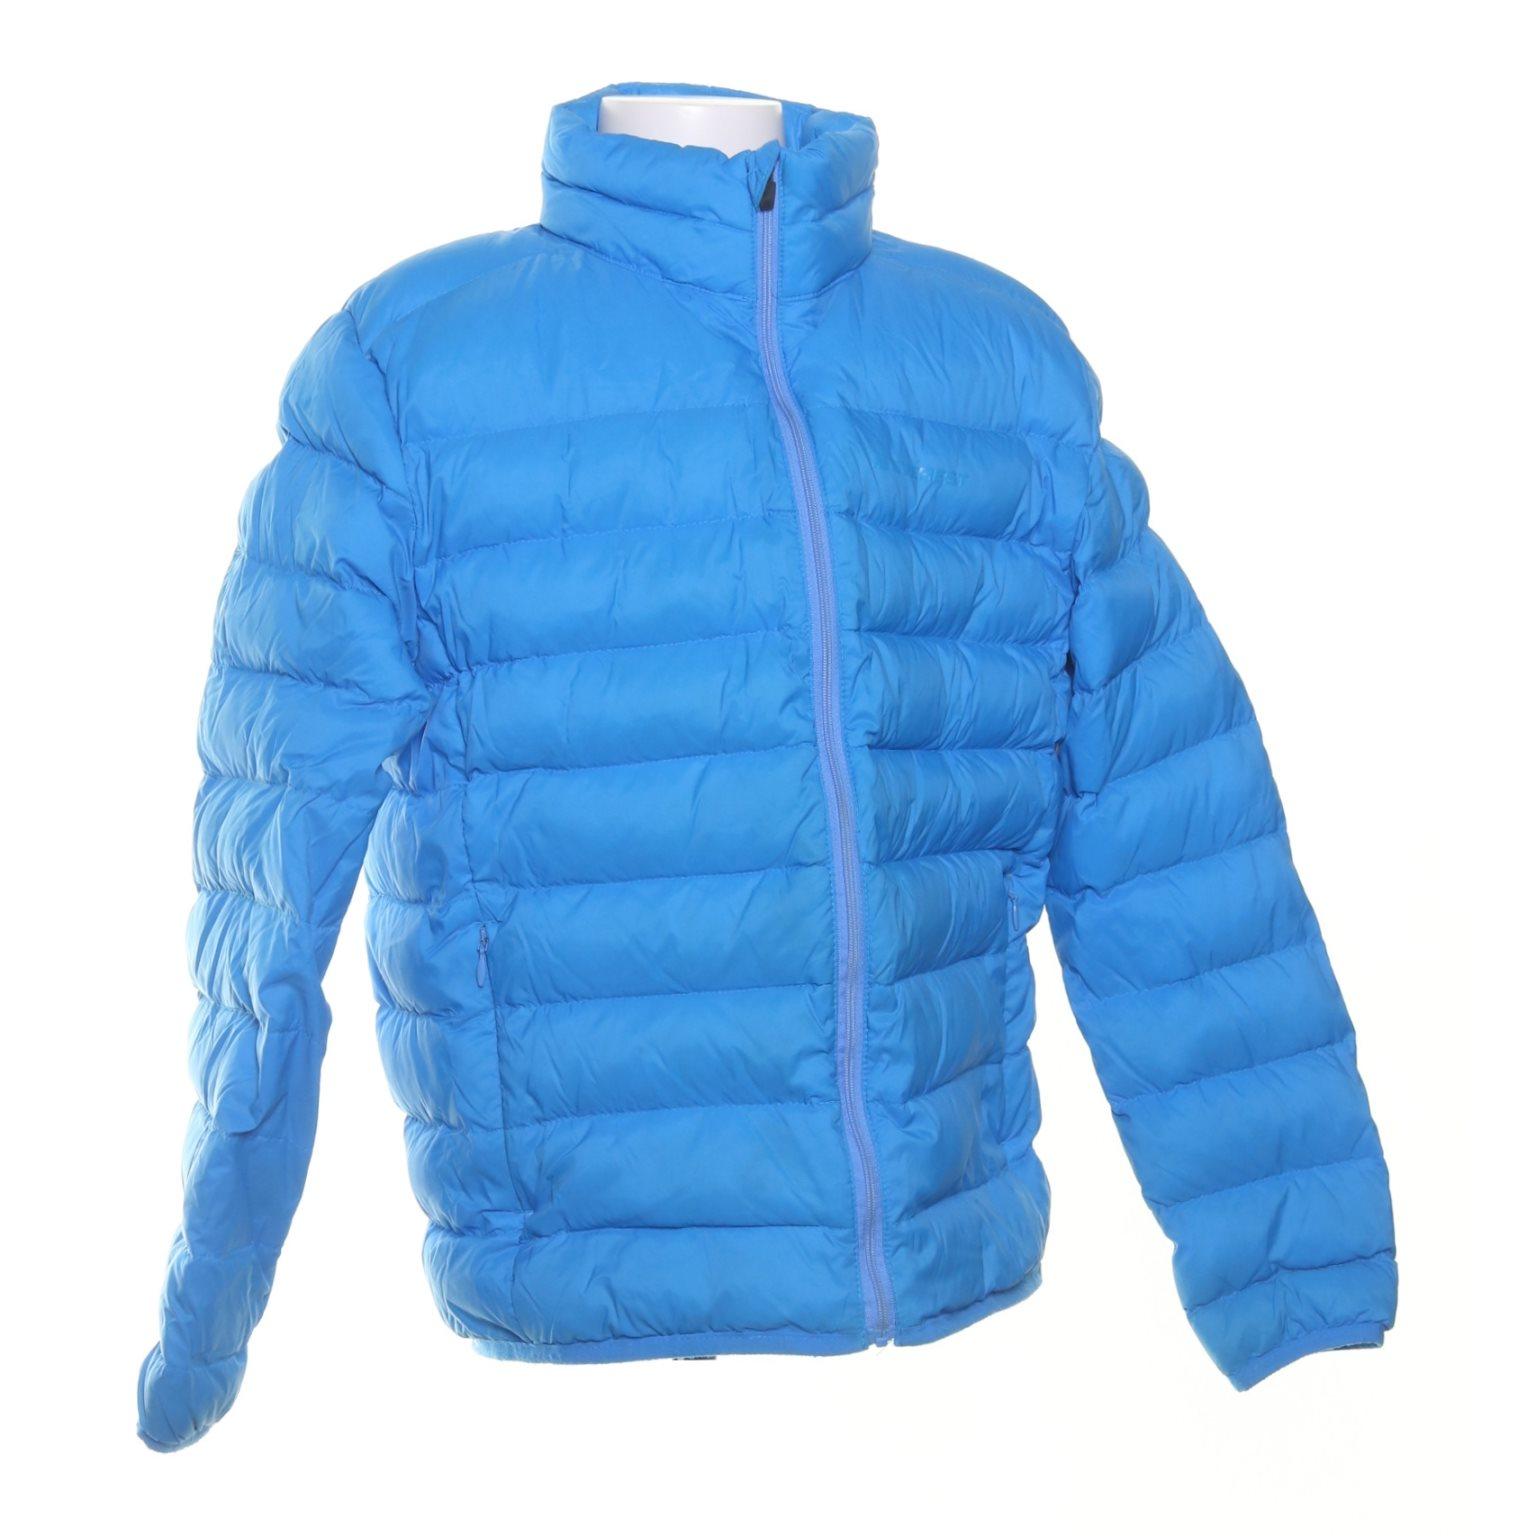 42f30247d11a Everest, Jacka, Strl: 146/152, Blå, Nylon.. (341247029) ᐈ Sellpy på ...